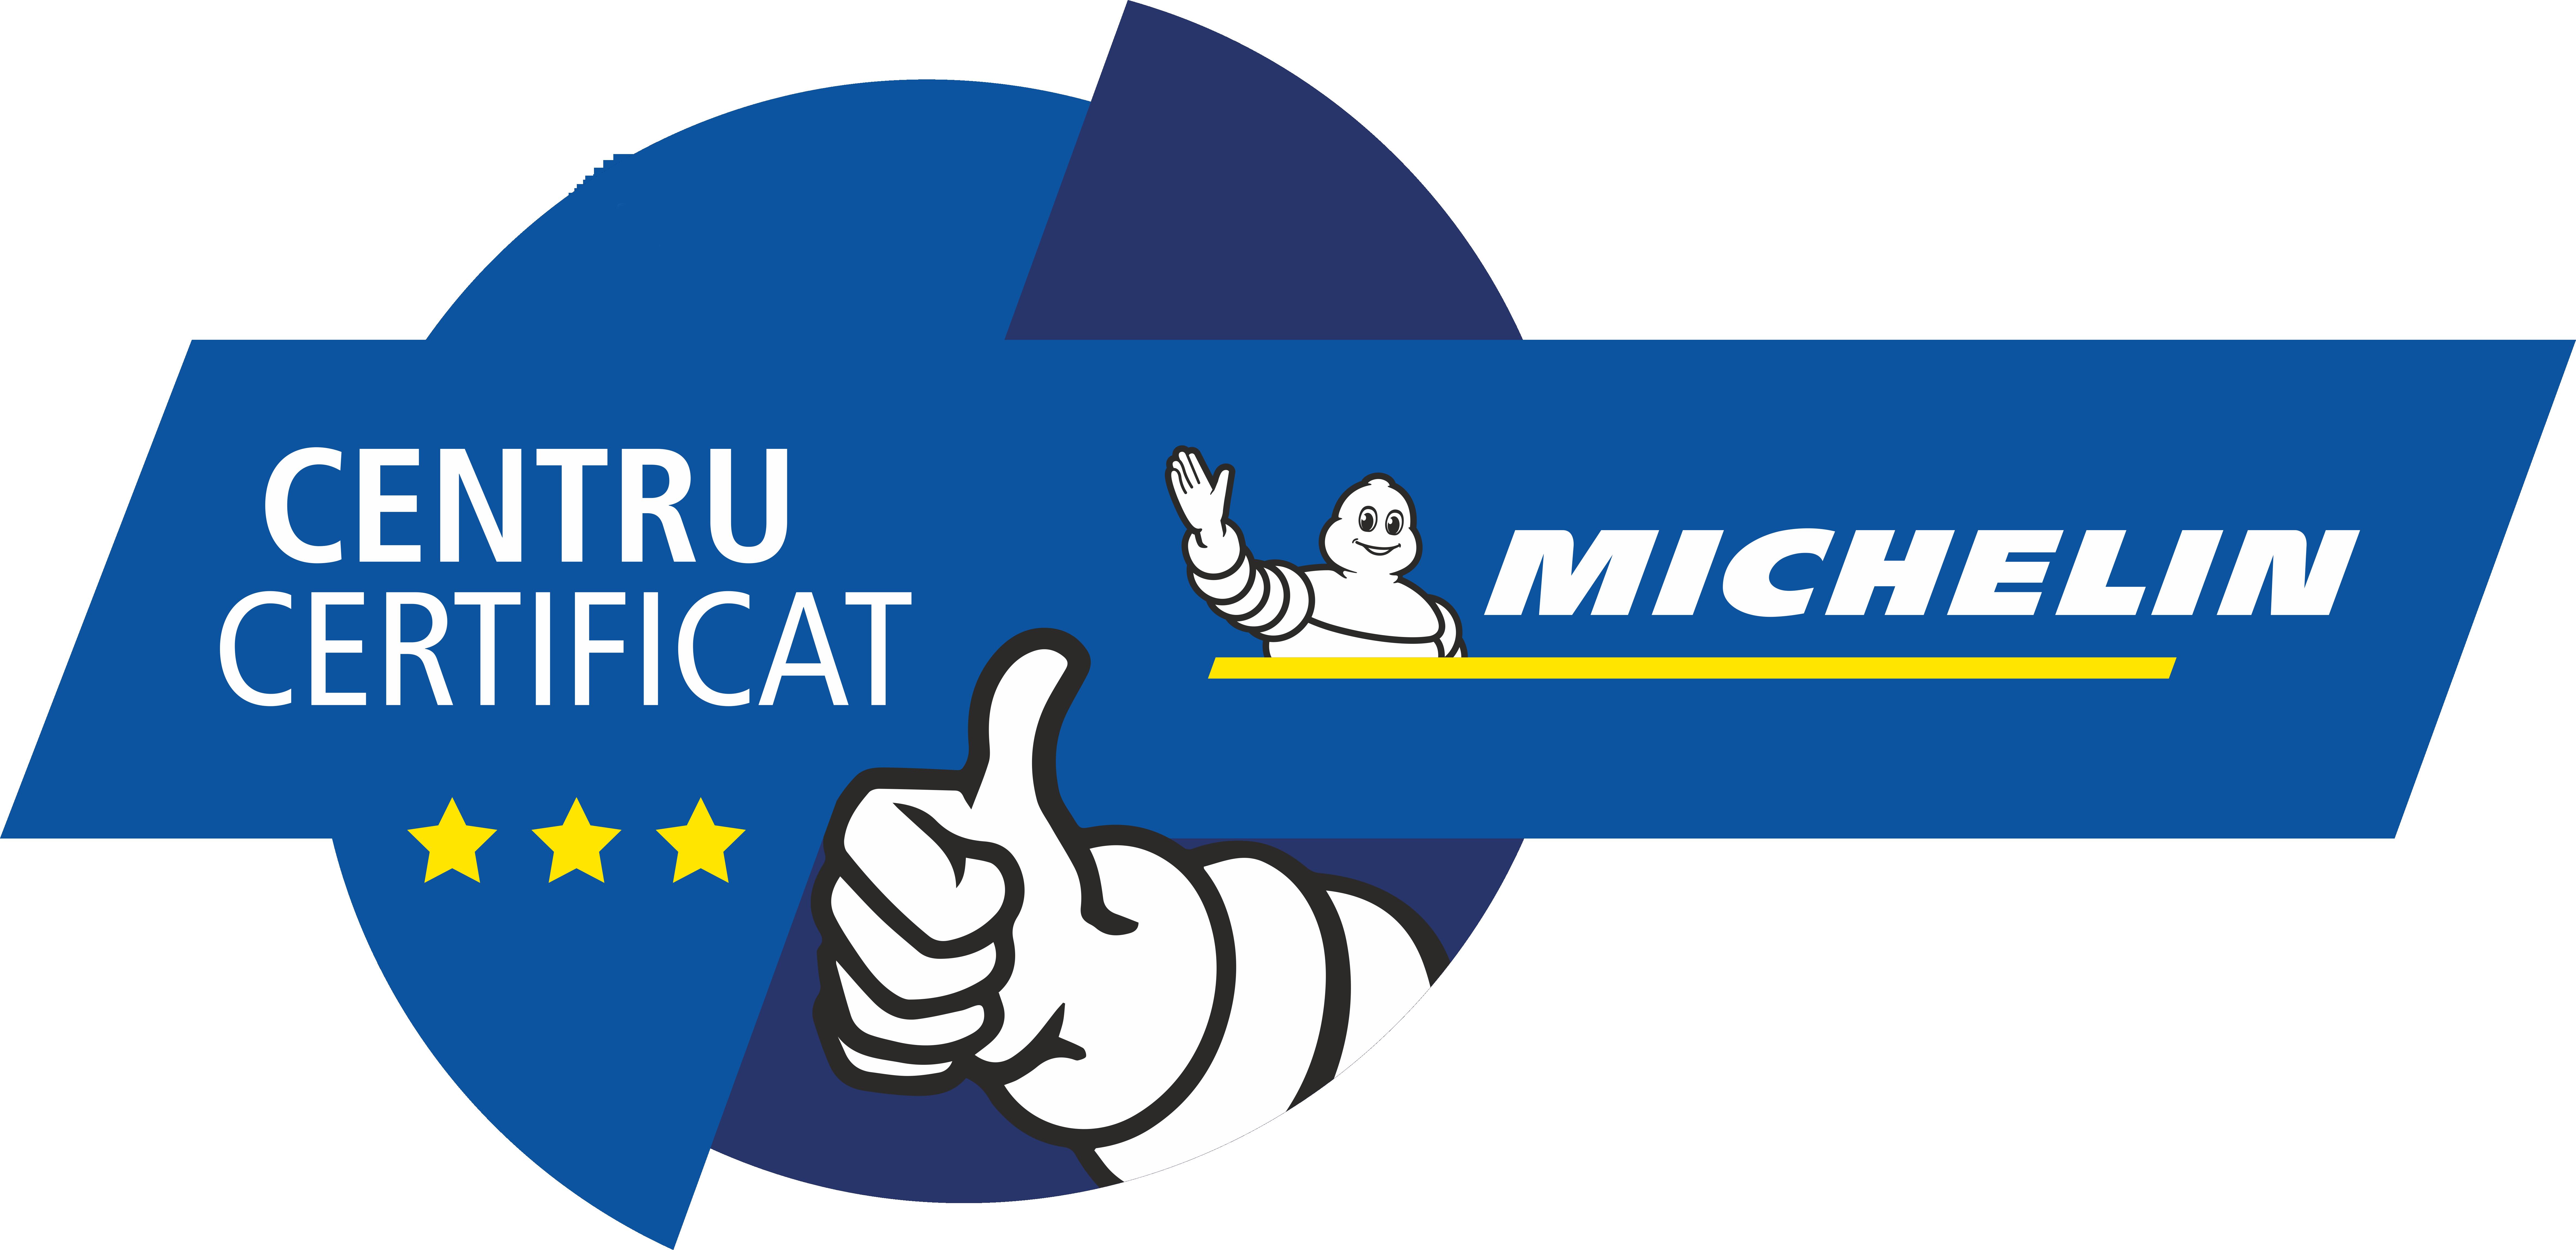 BADROM-Centru-Certificat-MICHELIN